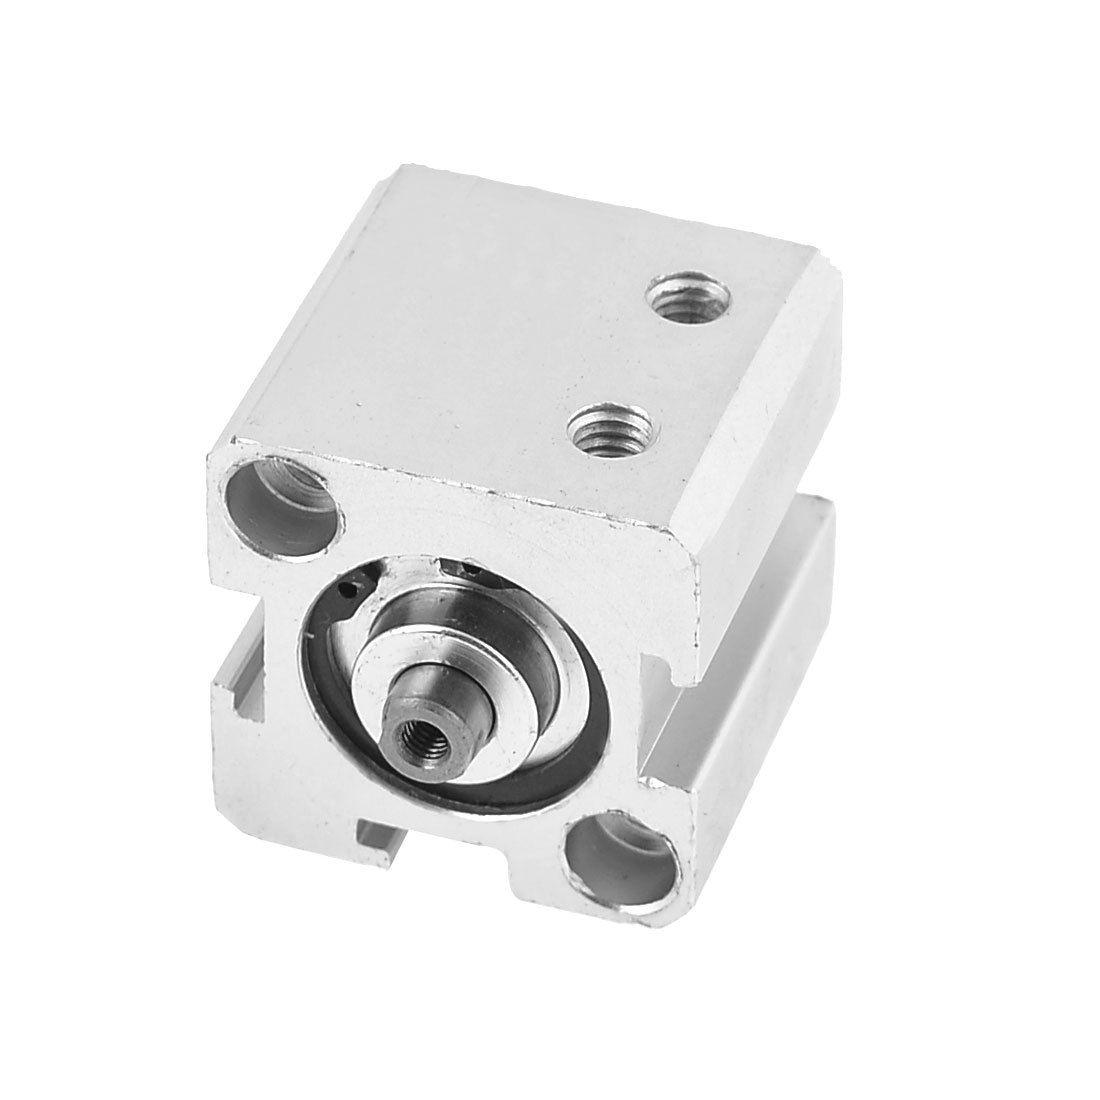 1 Pcs 20mm Bore 10mm Stroke Stainless steel Pneumatic Air Cylinder SDA20-101 Pcs 20mm Bore 10mm Stroke Stainless steel Pneumatic Air Cylinder SDA20-10